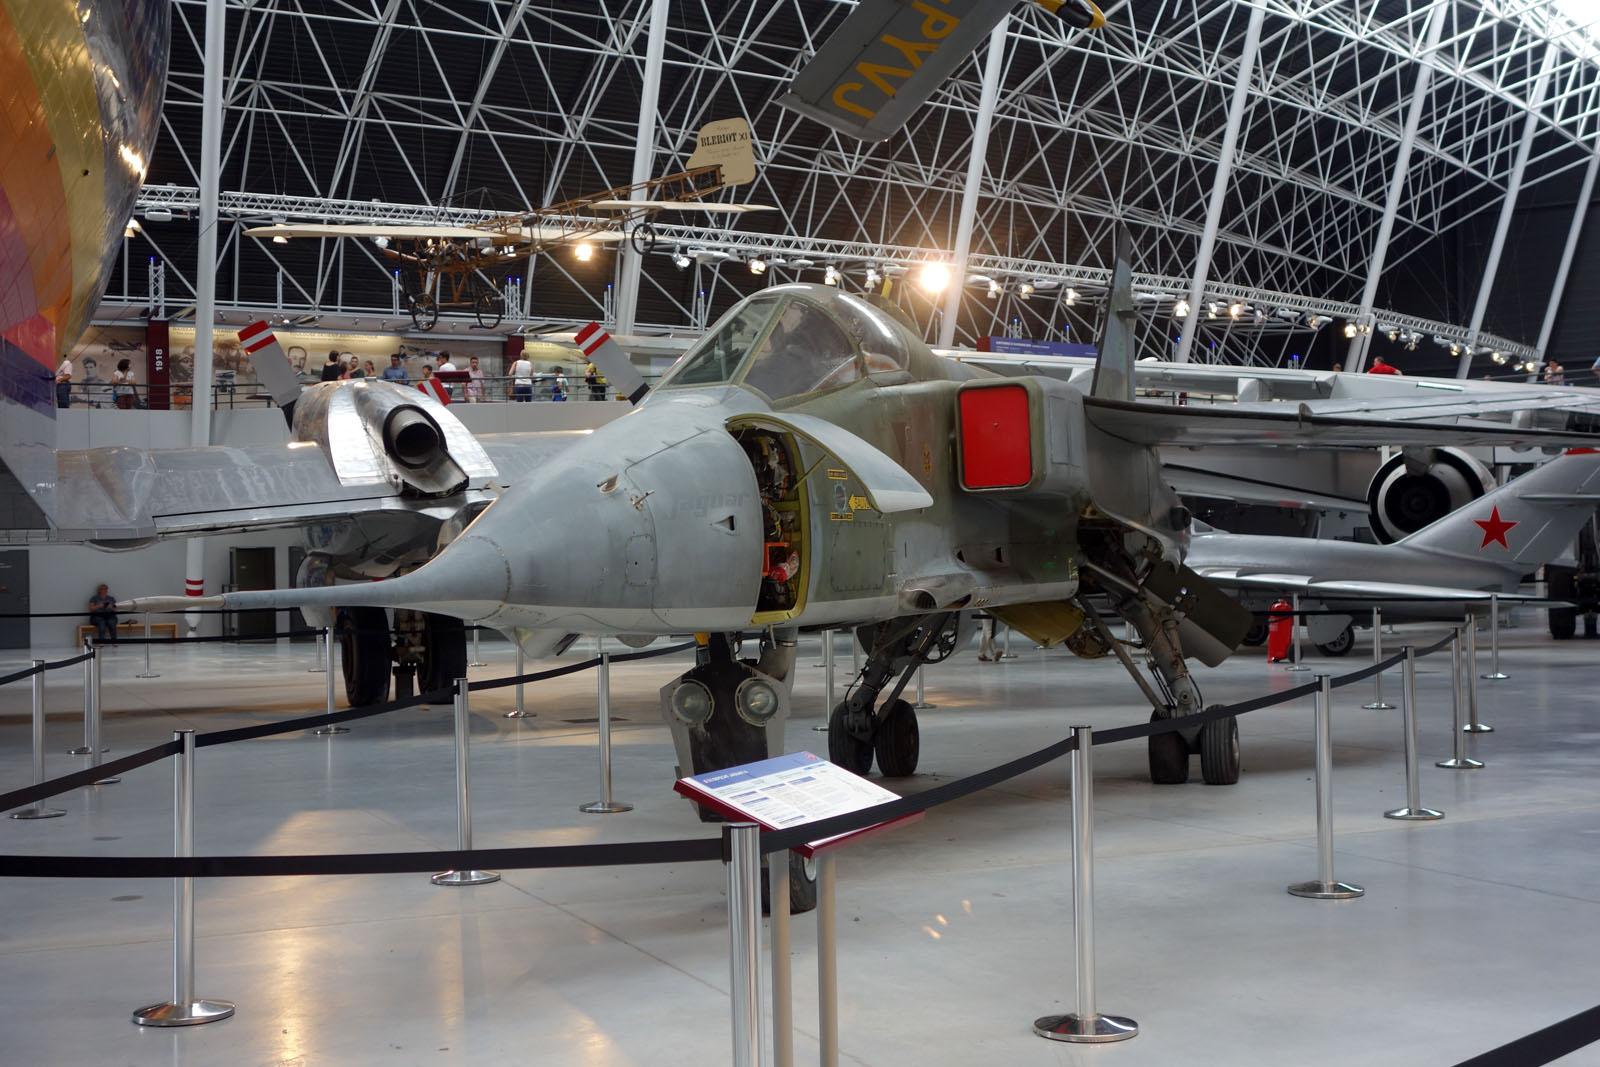 SEPECAT Jaguar A - Aviationmuseum